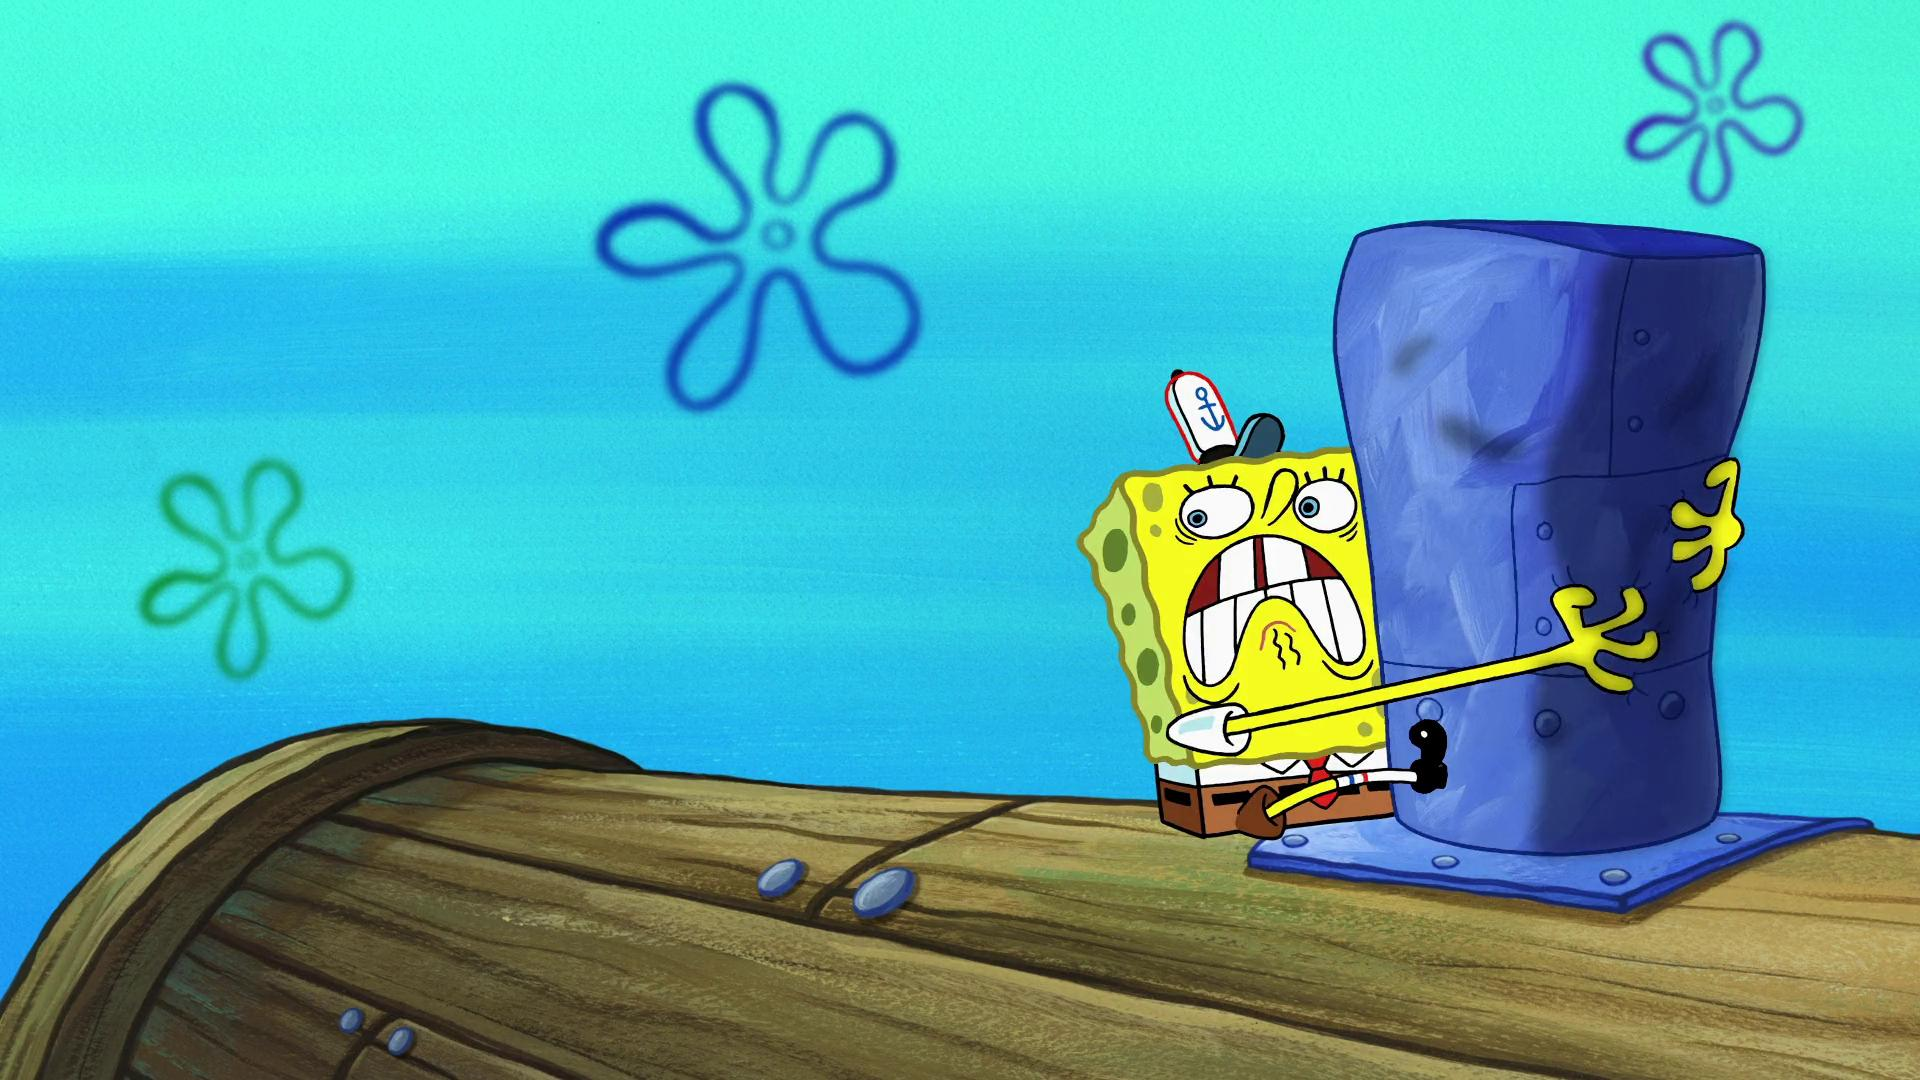 spongebob stuck on the roof full